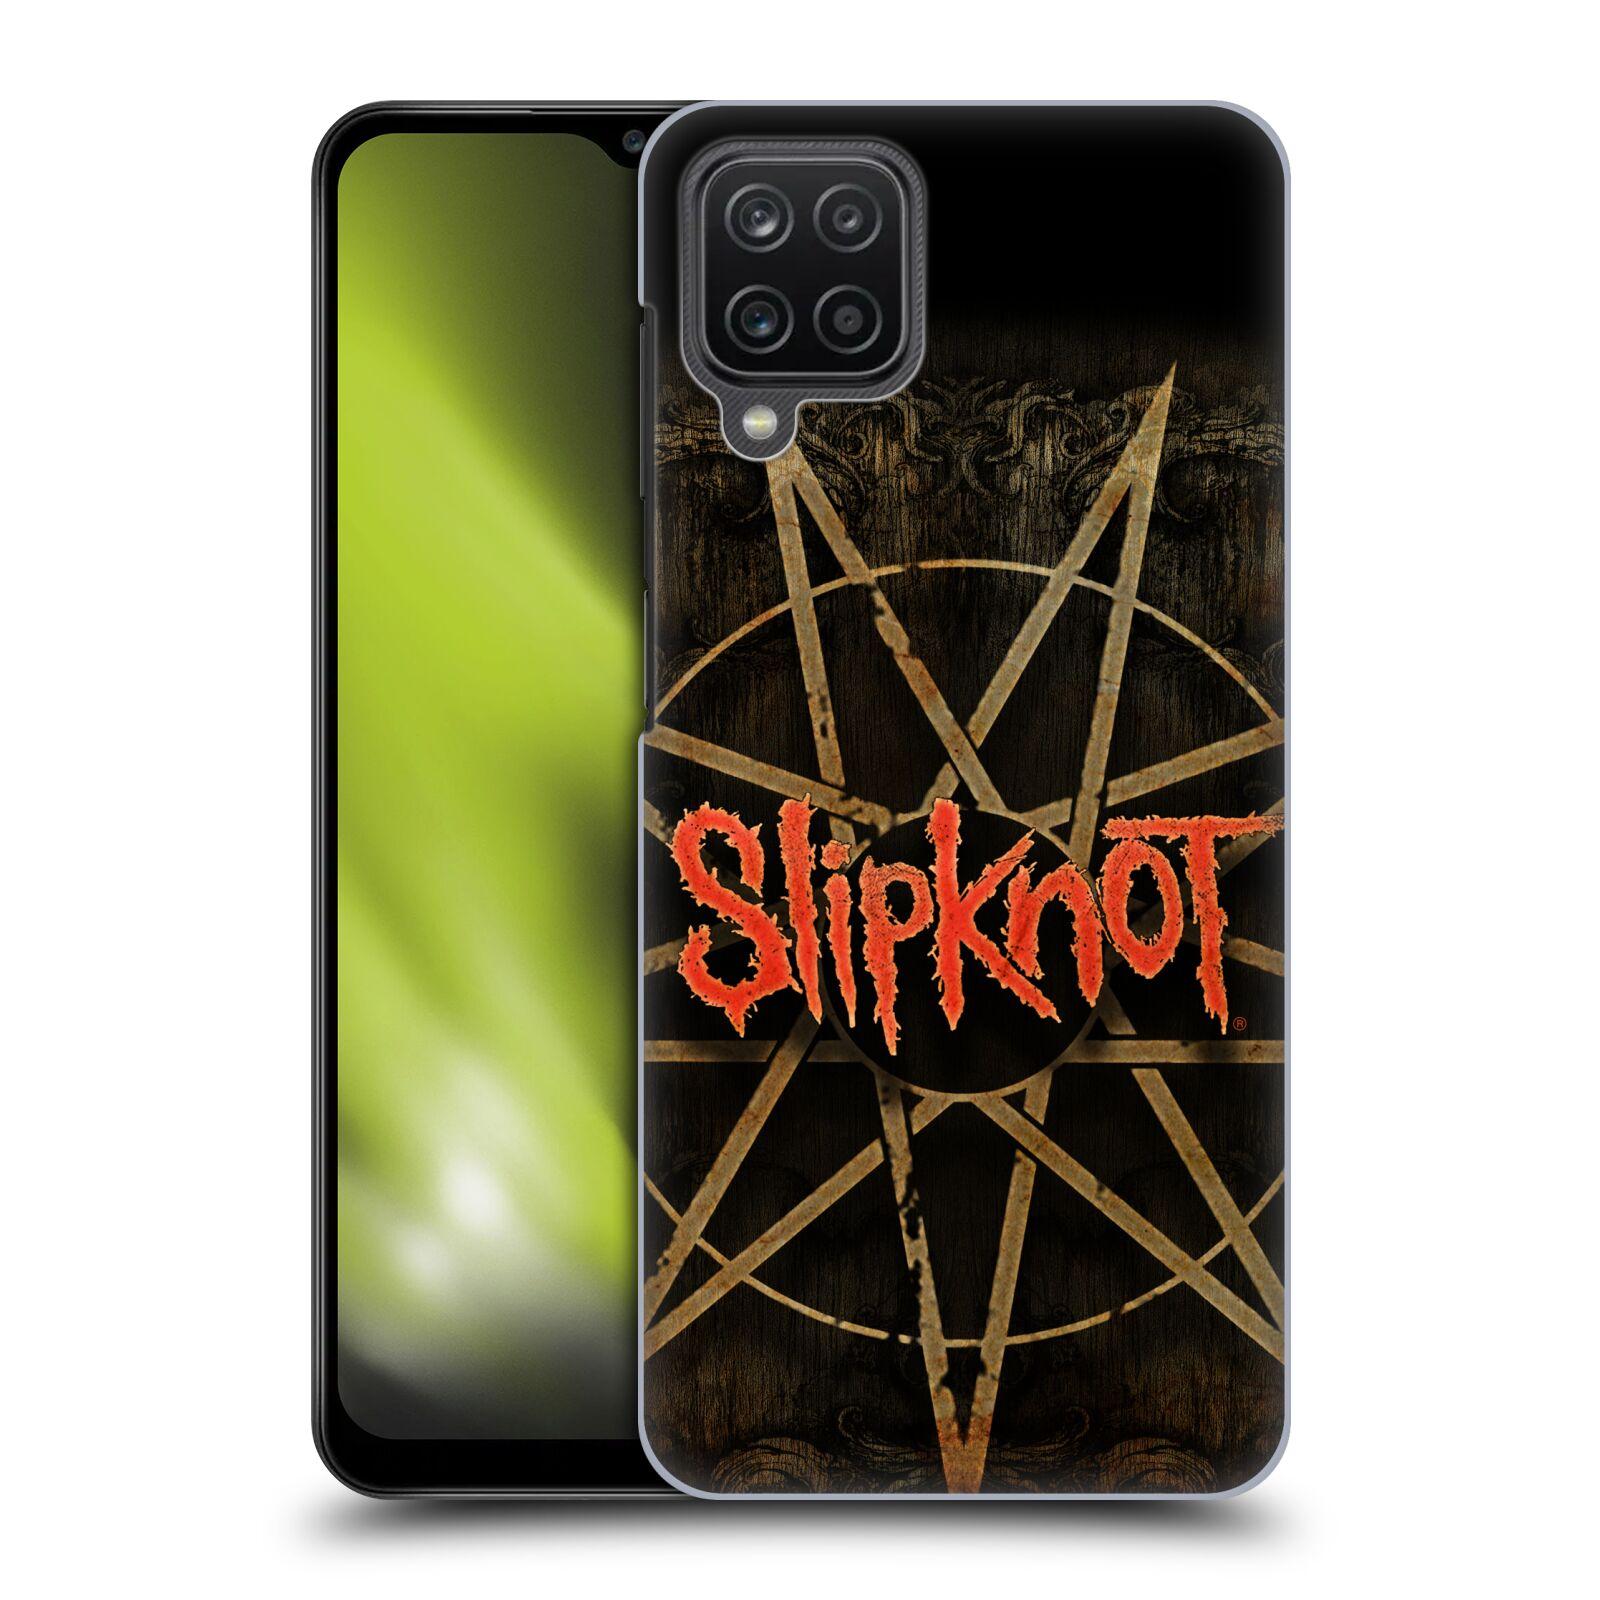 Plastové pouzdro na mobil Samsung Galaxy A12 - Head Case - Slipknot - Znak